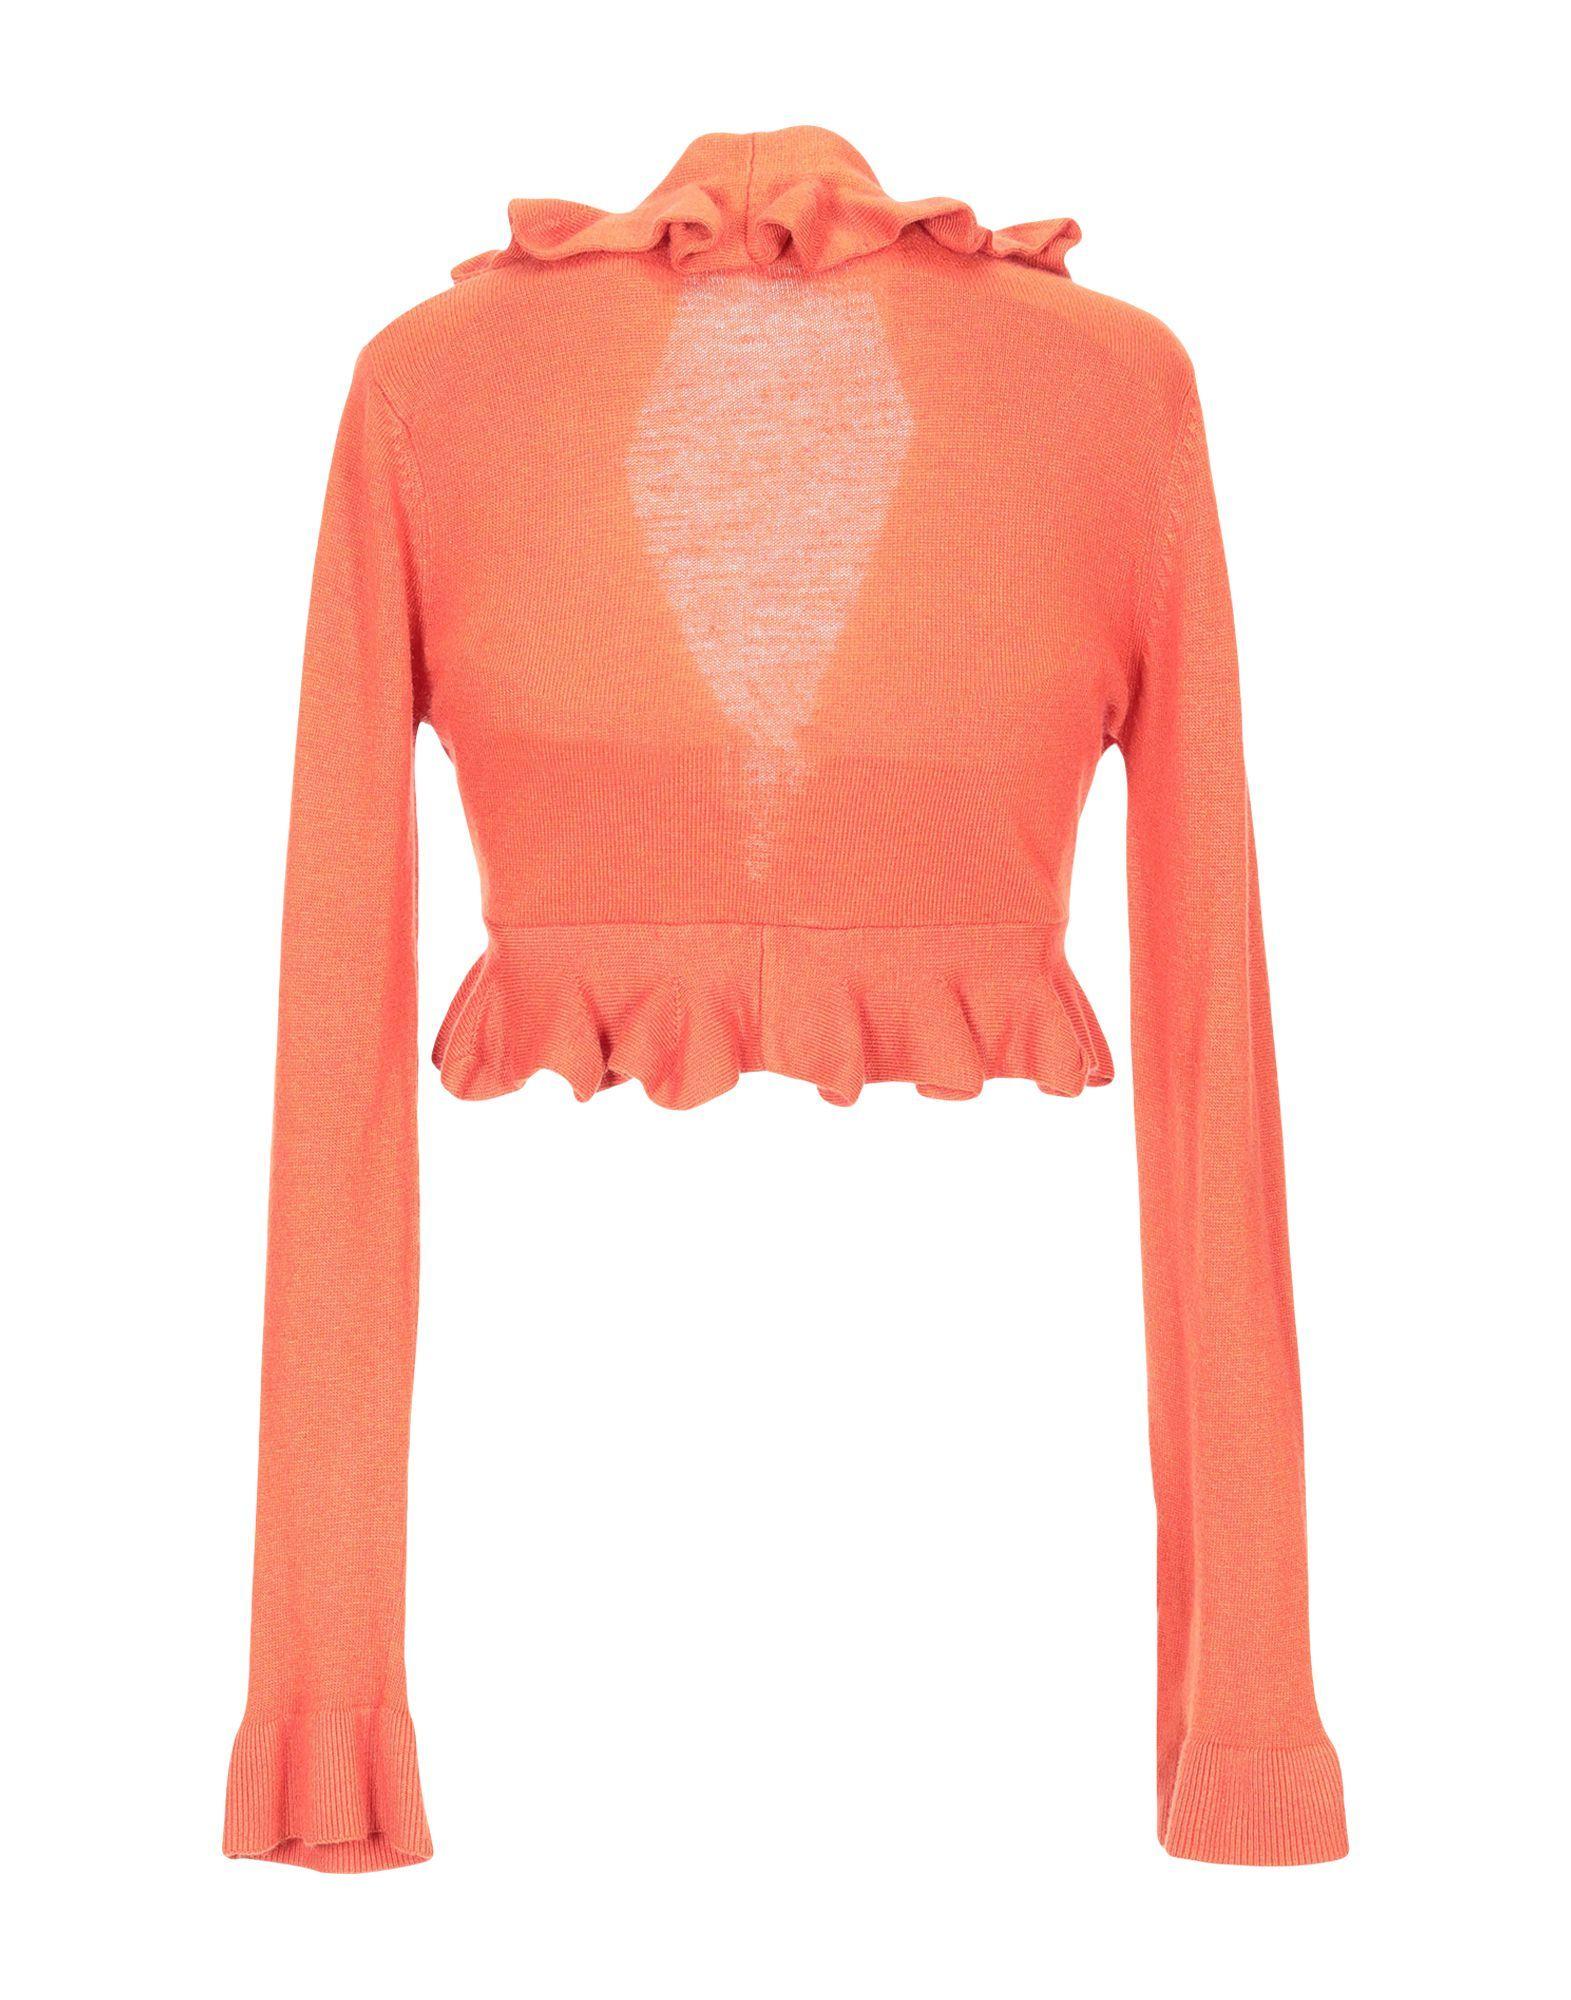 Pierre Balmain Orange Ruffle Knit Cardigan